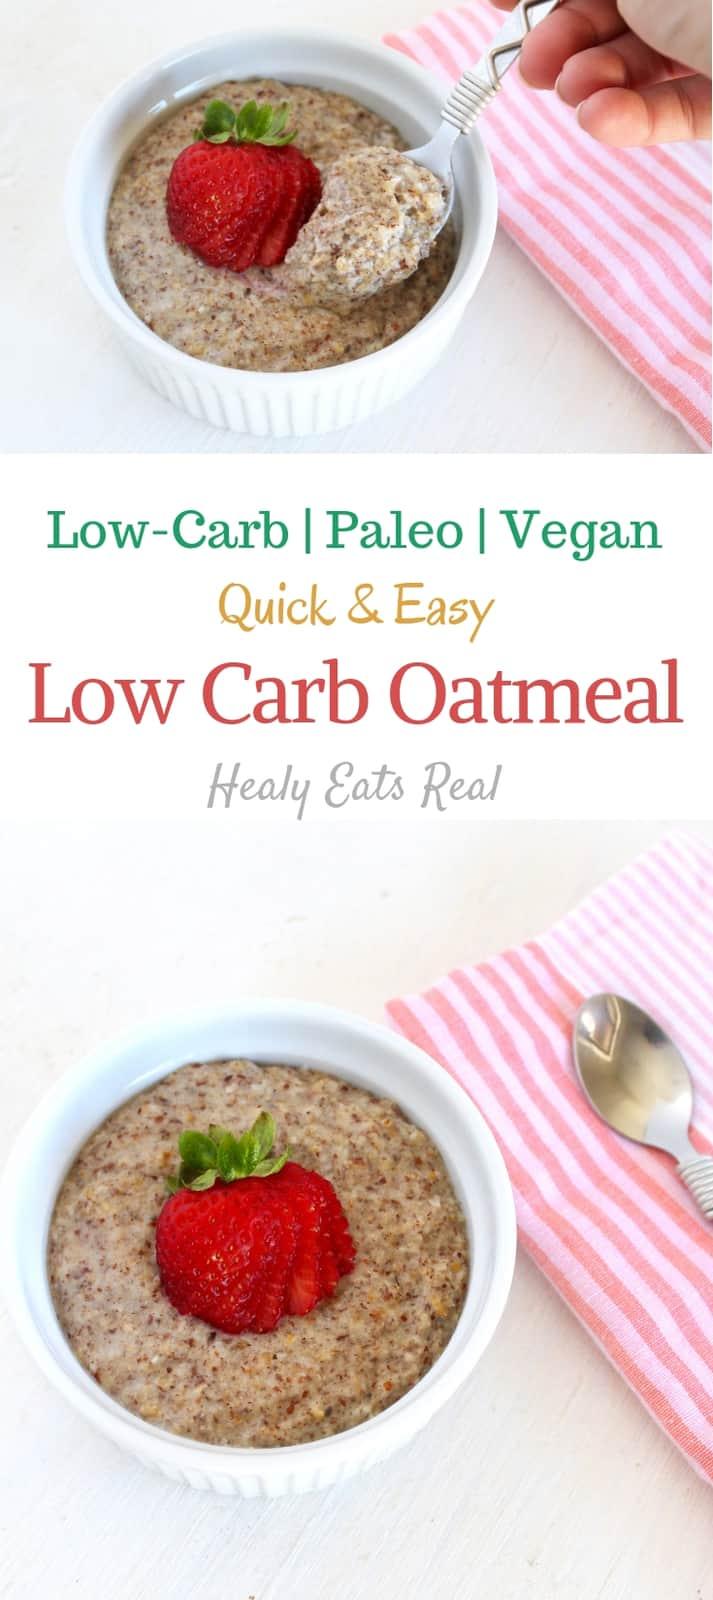 Low Carb Oatmeal Recipe (Vegan & Paleo)